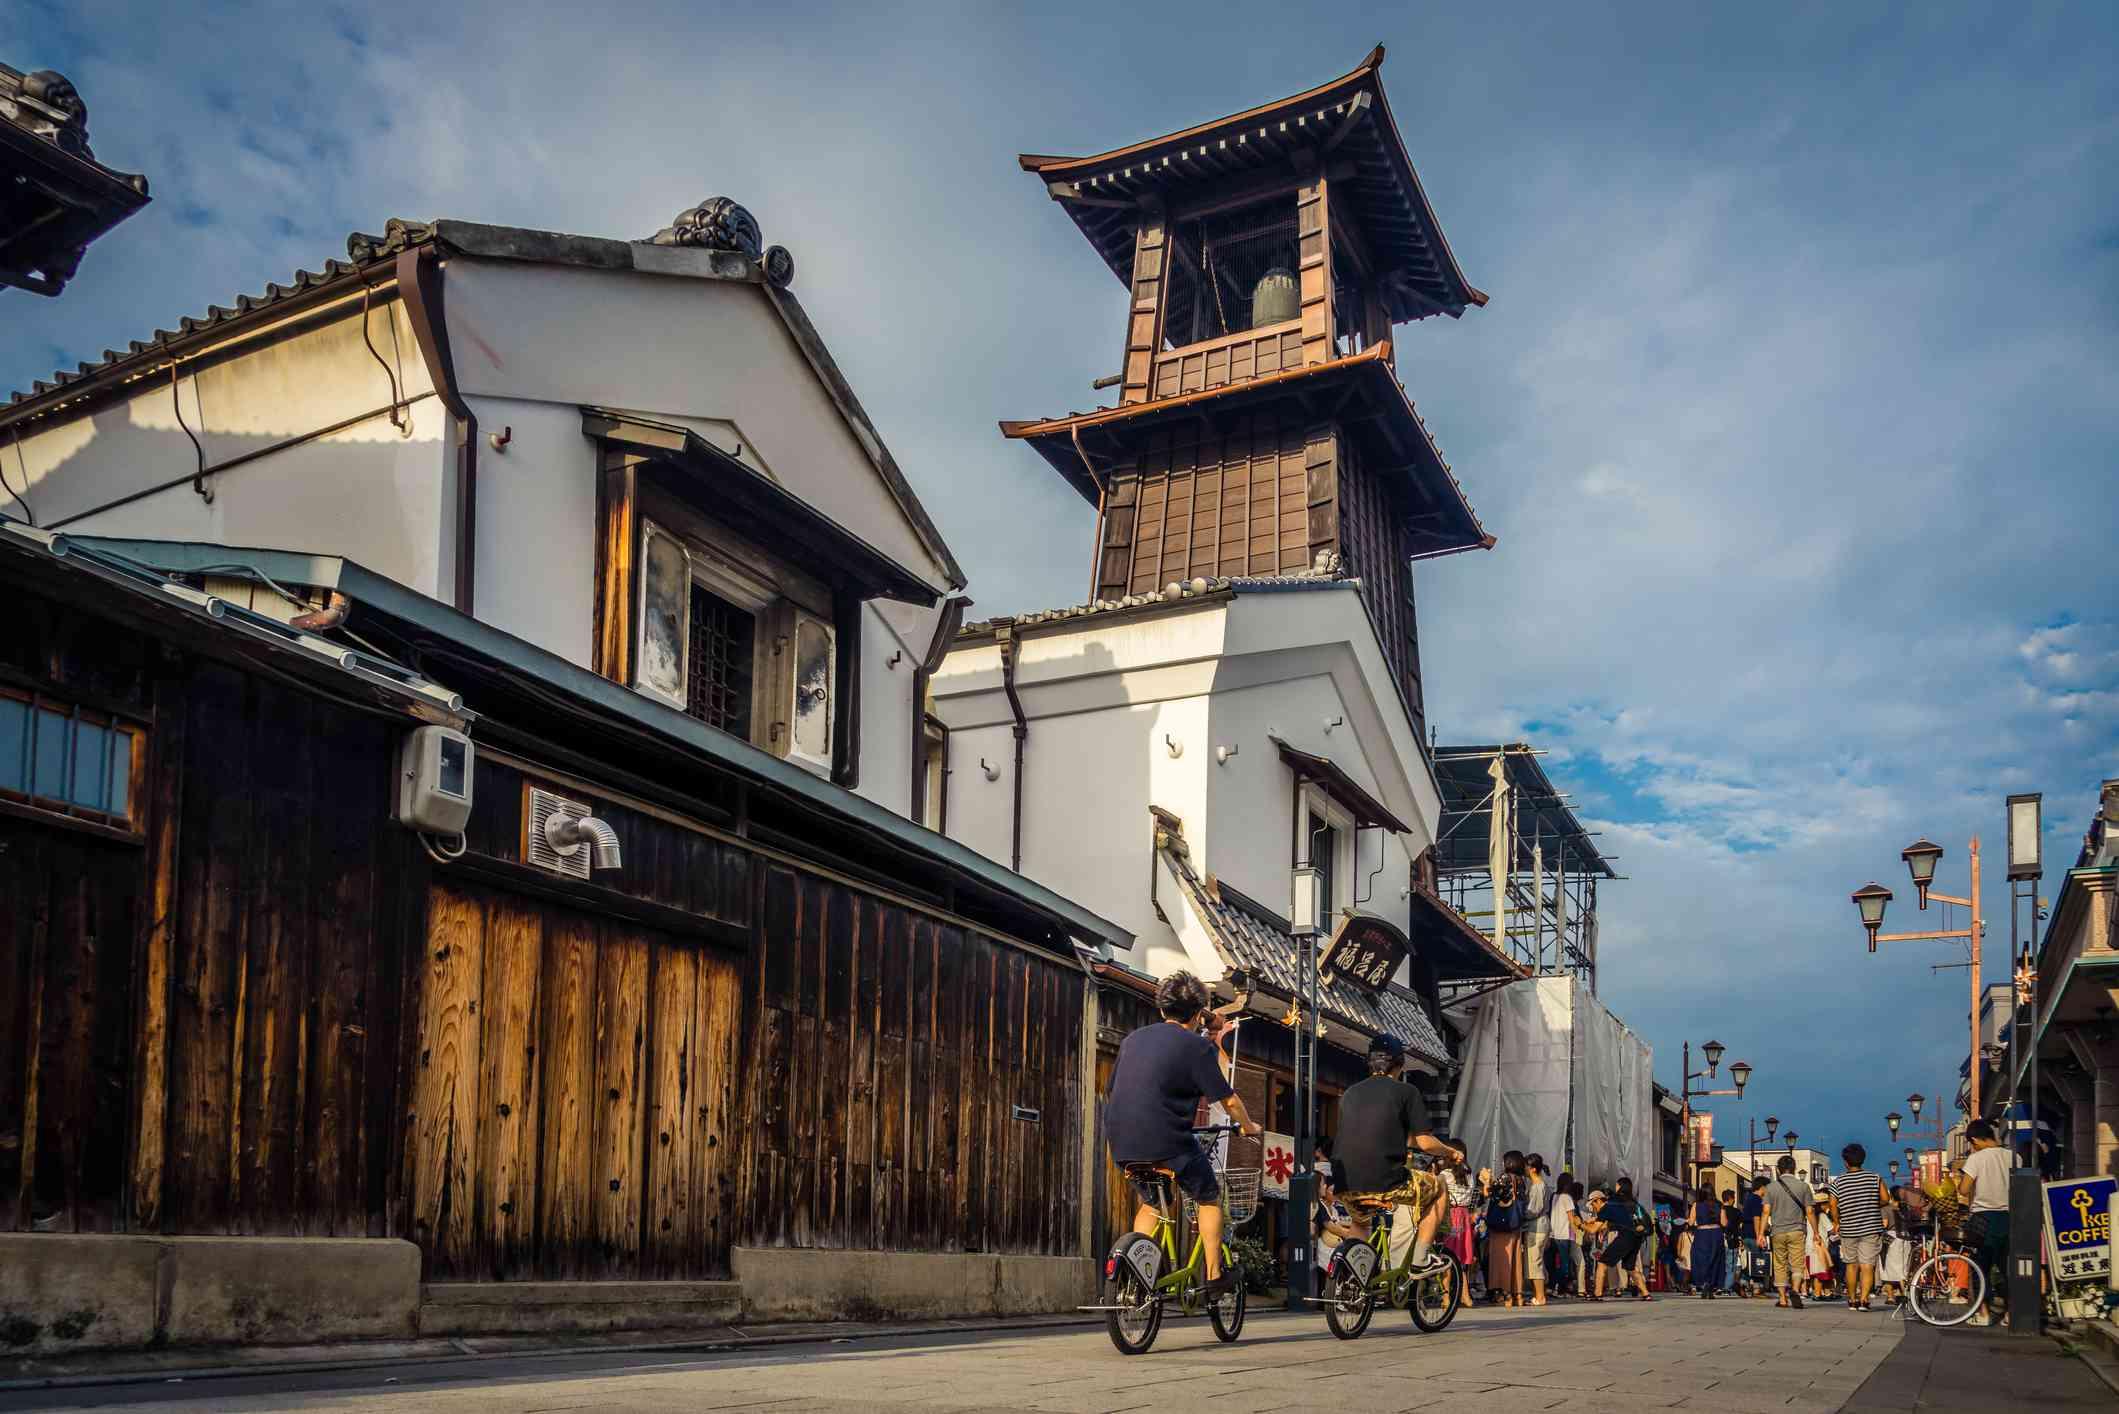 People visiting the bell tower in the Kurazukuri district of Kawagoe